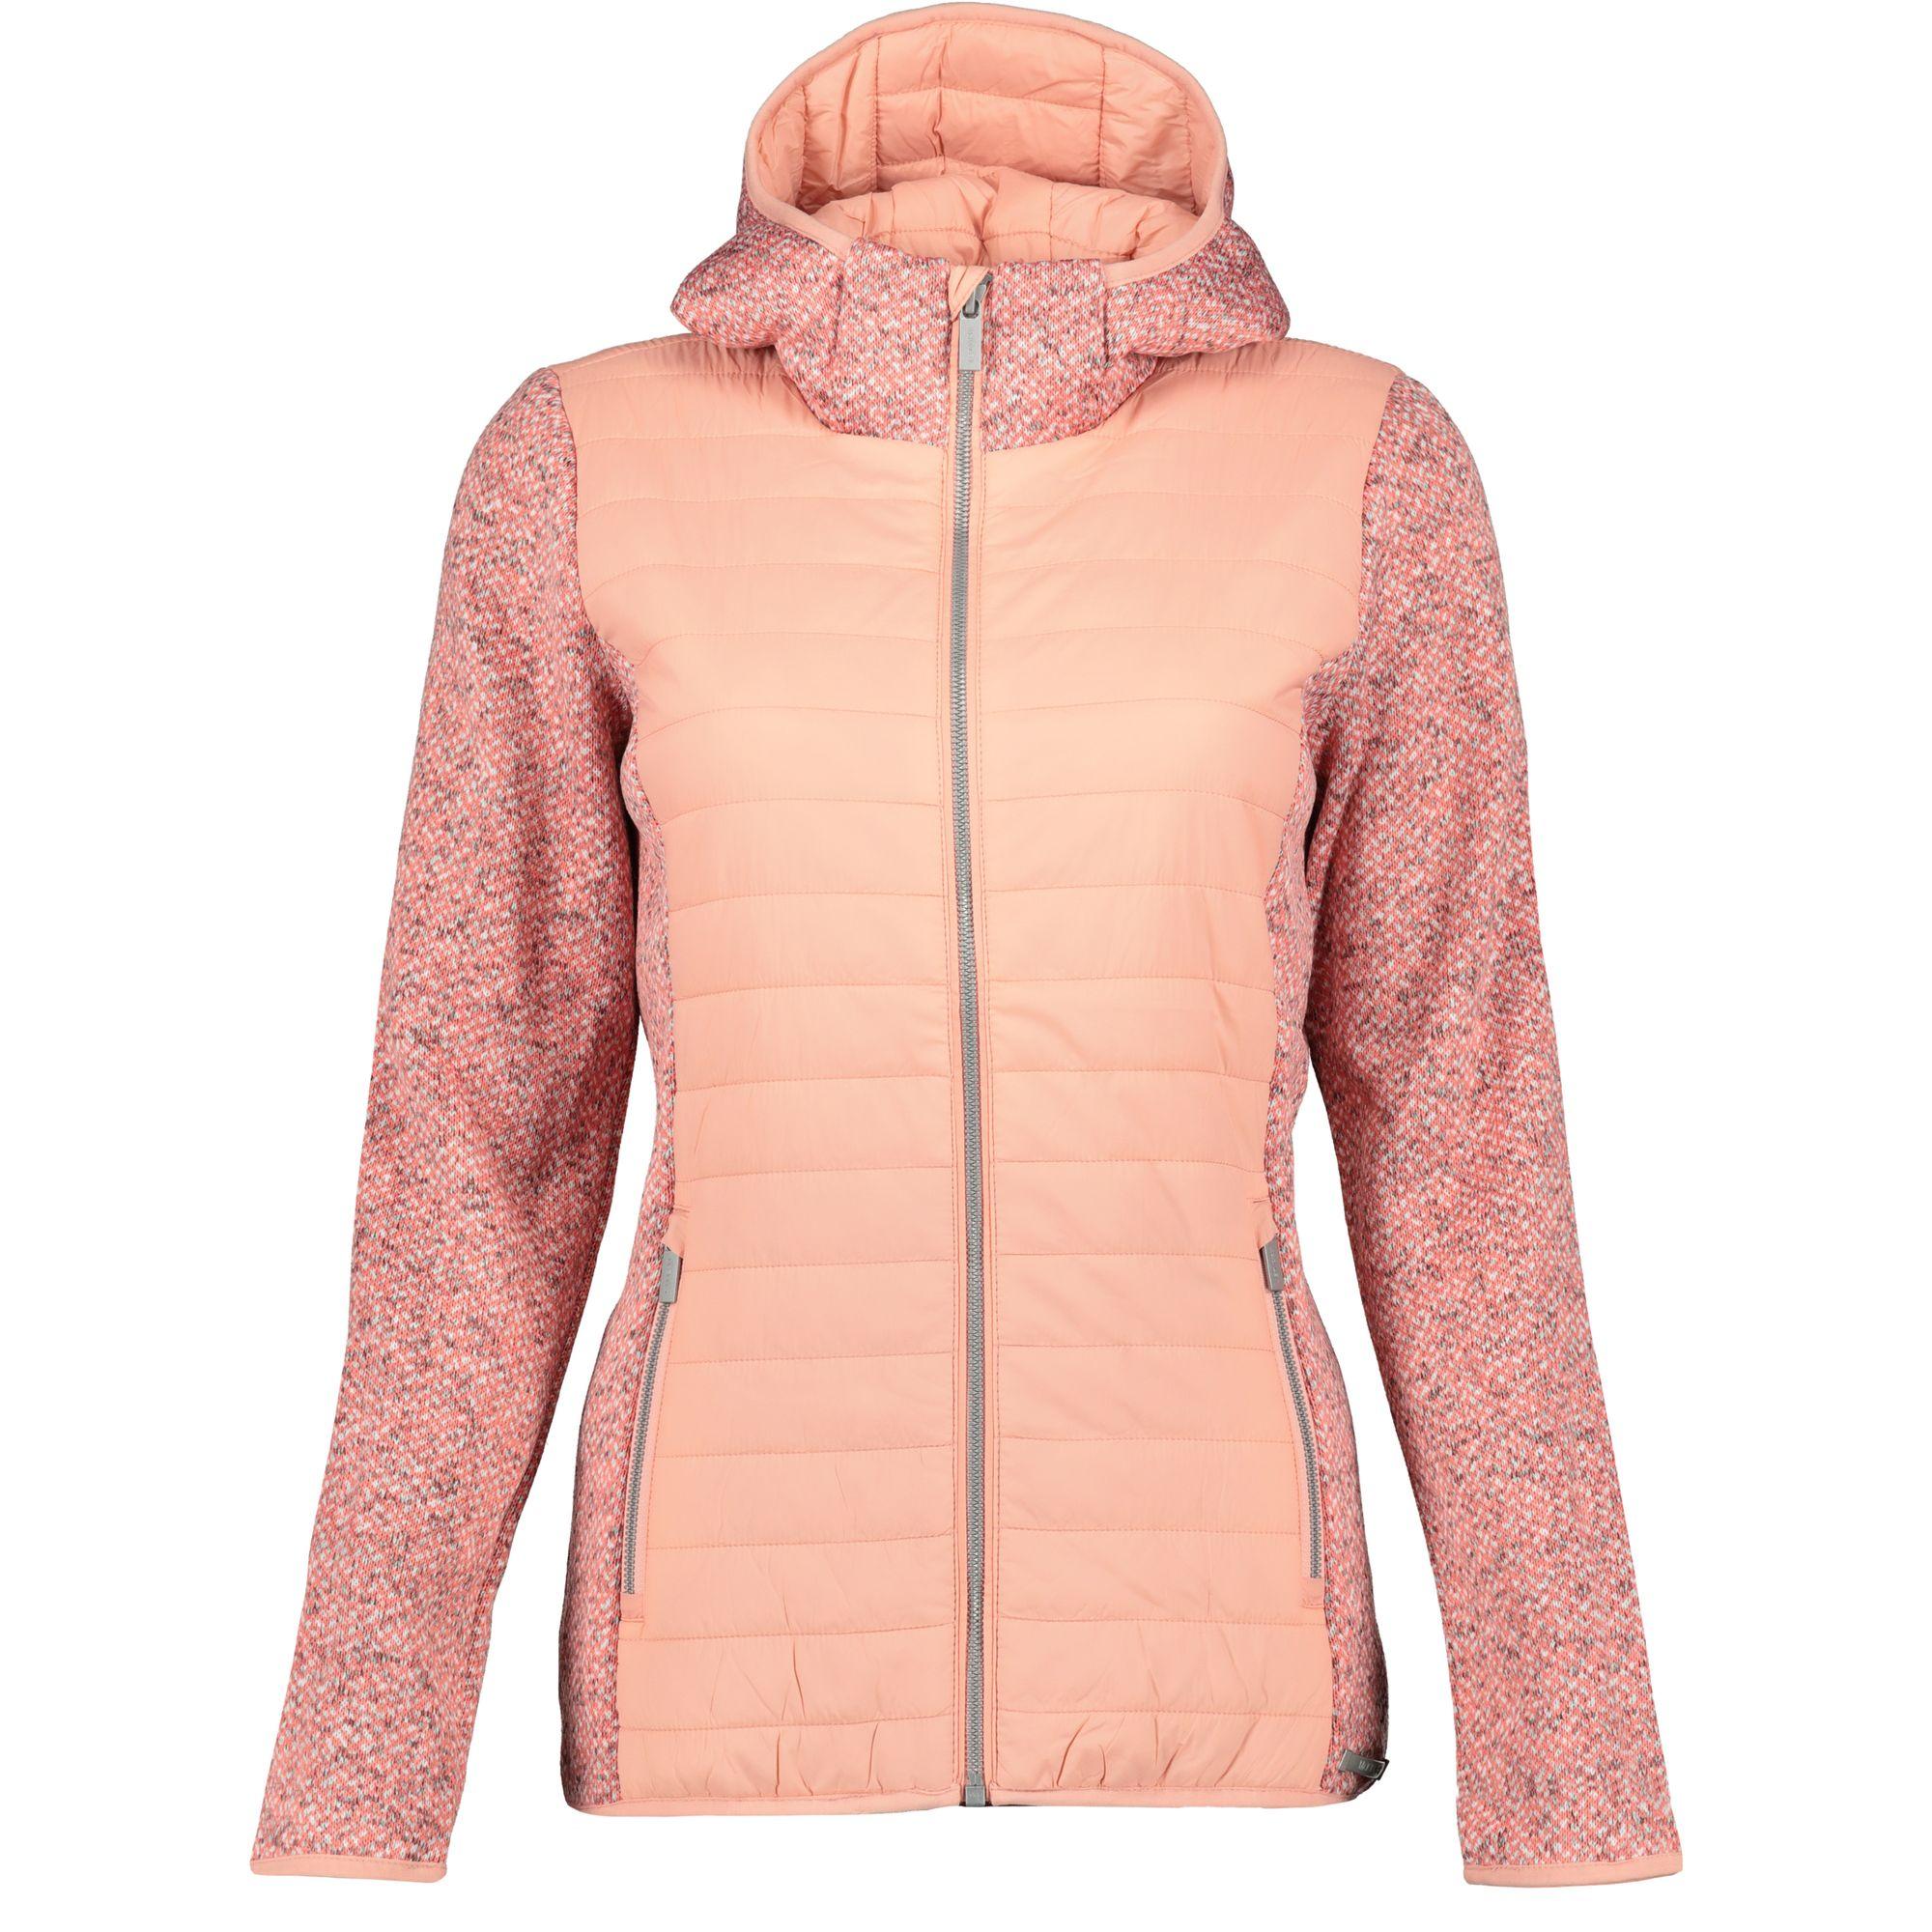 Ola Mckinley Fleece Show Jacket Original Wms Hybrid Womens Details About Title tsrxdQCBh